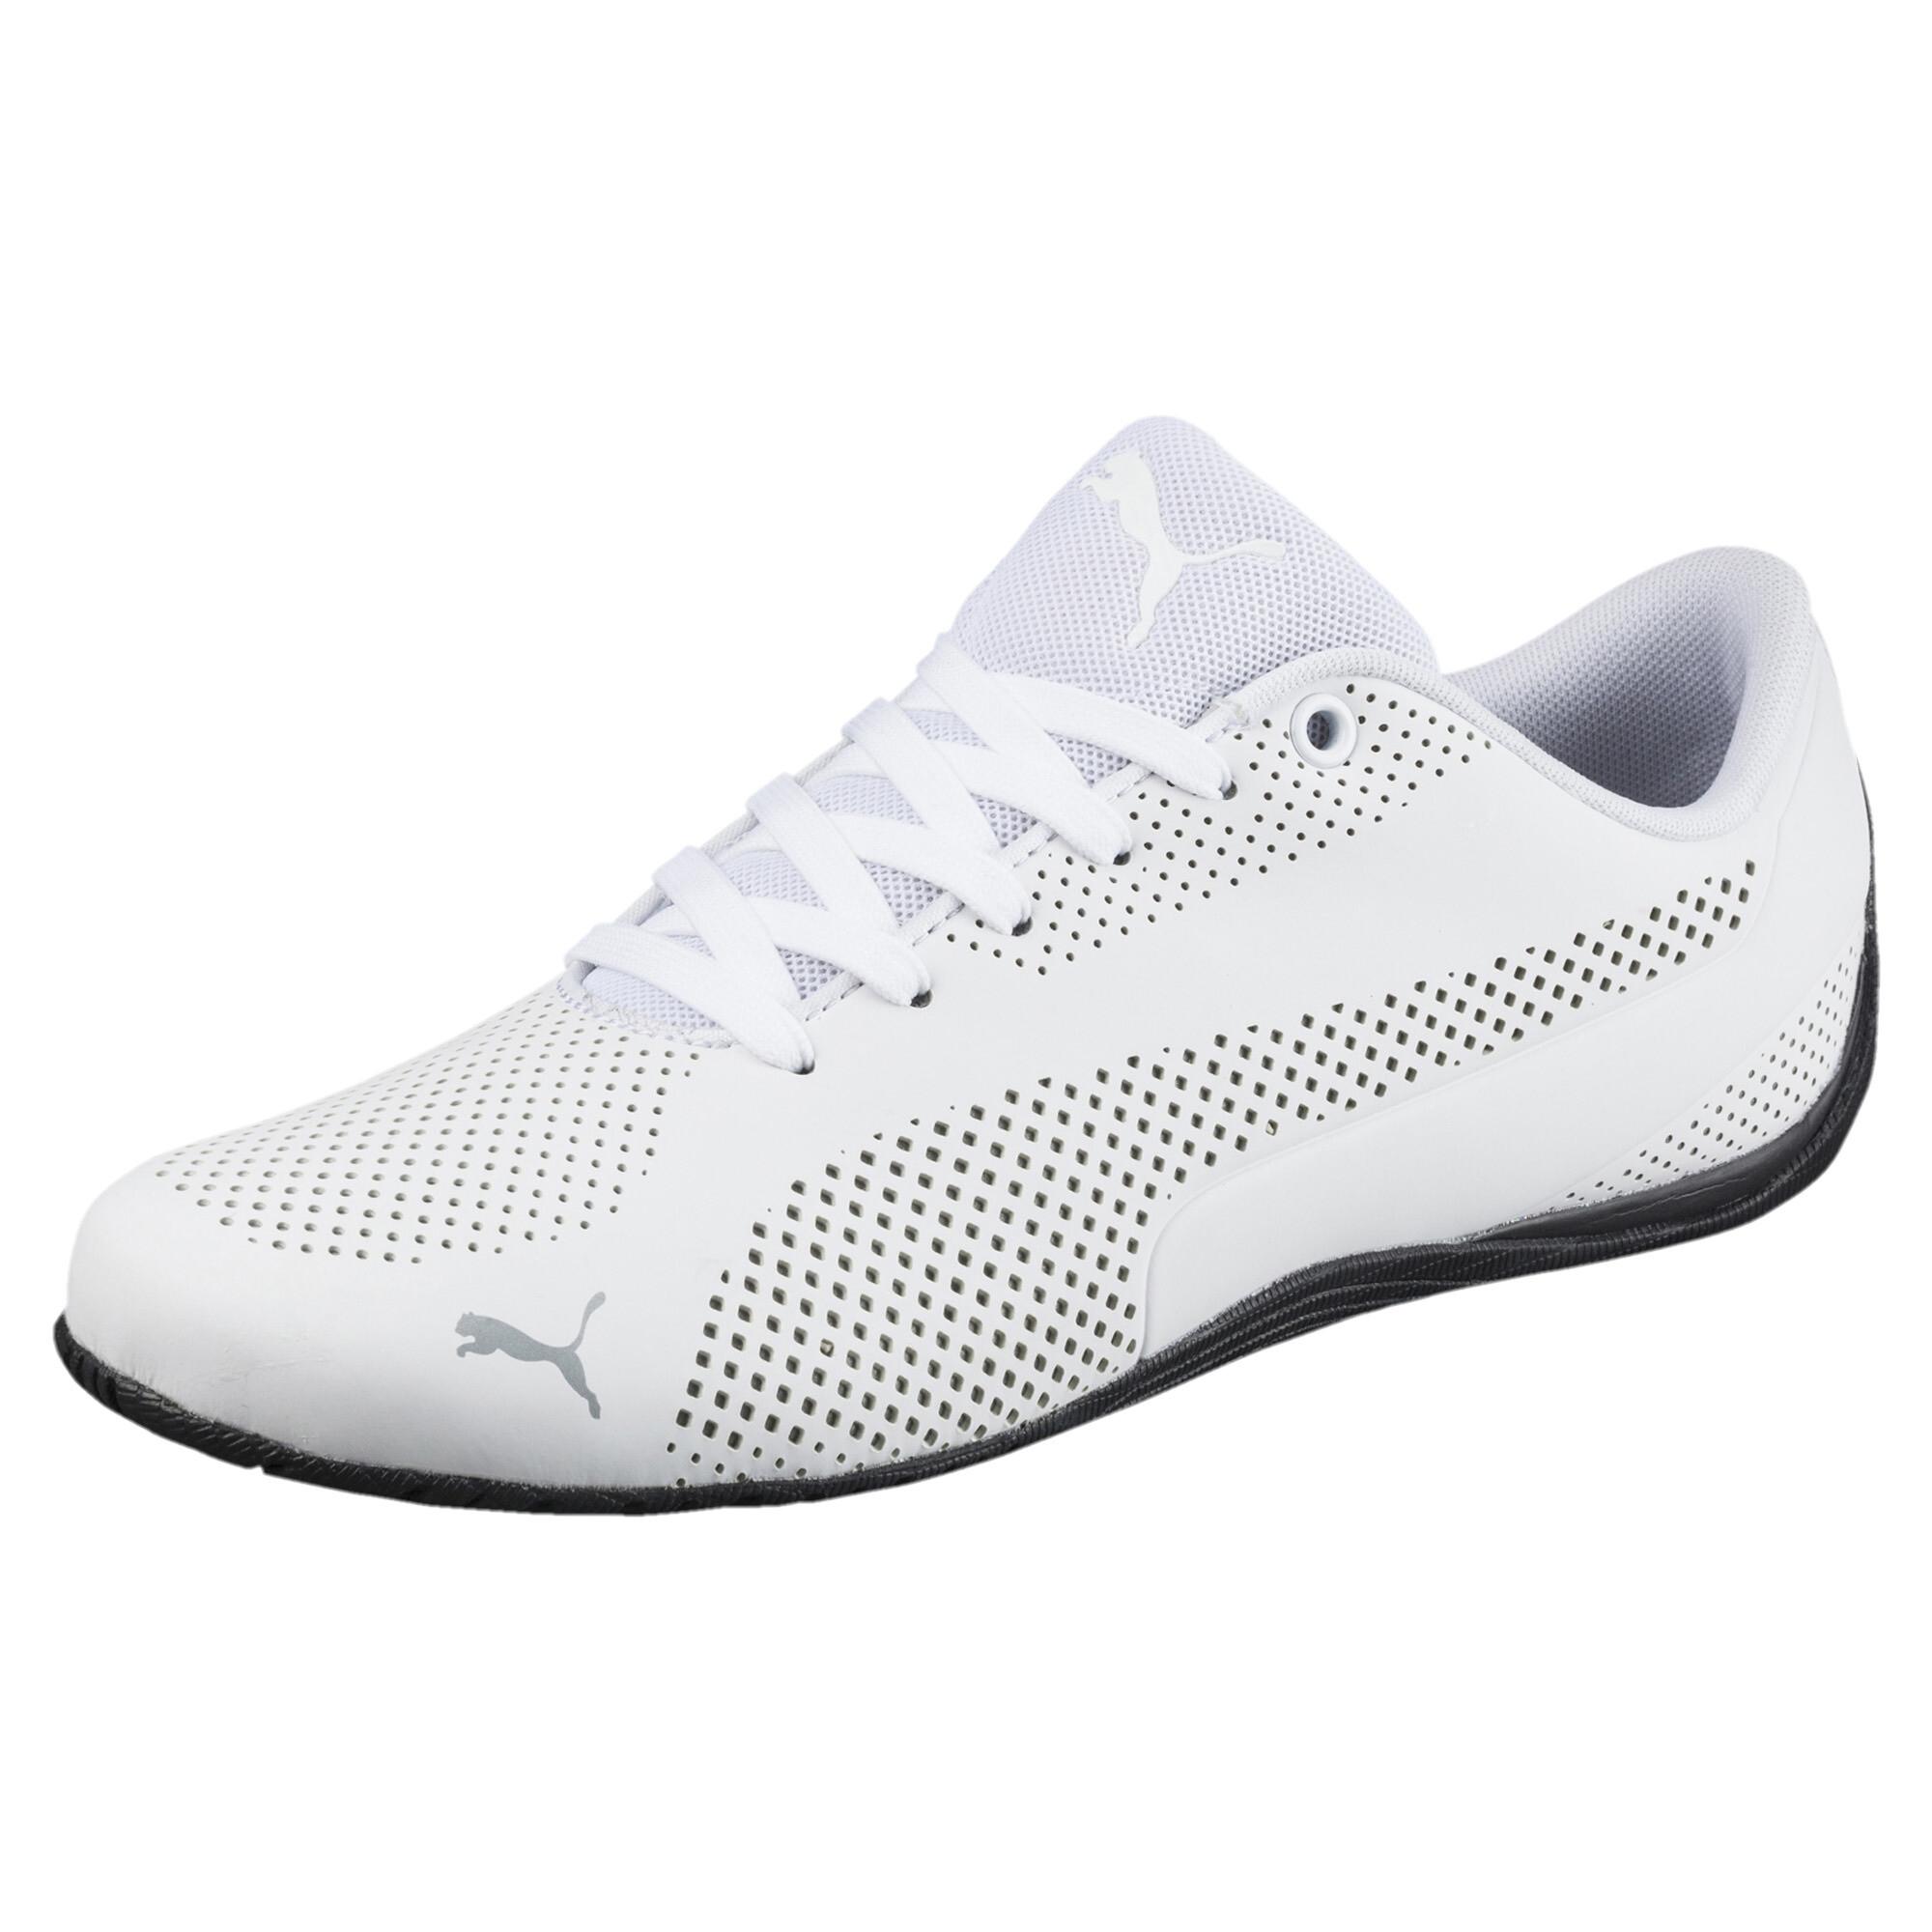 PUMA-Men-039-s-Drift-Cat-Ultra-Reflective-Shoes thumbnail 14